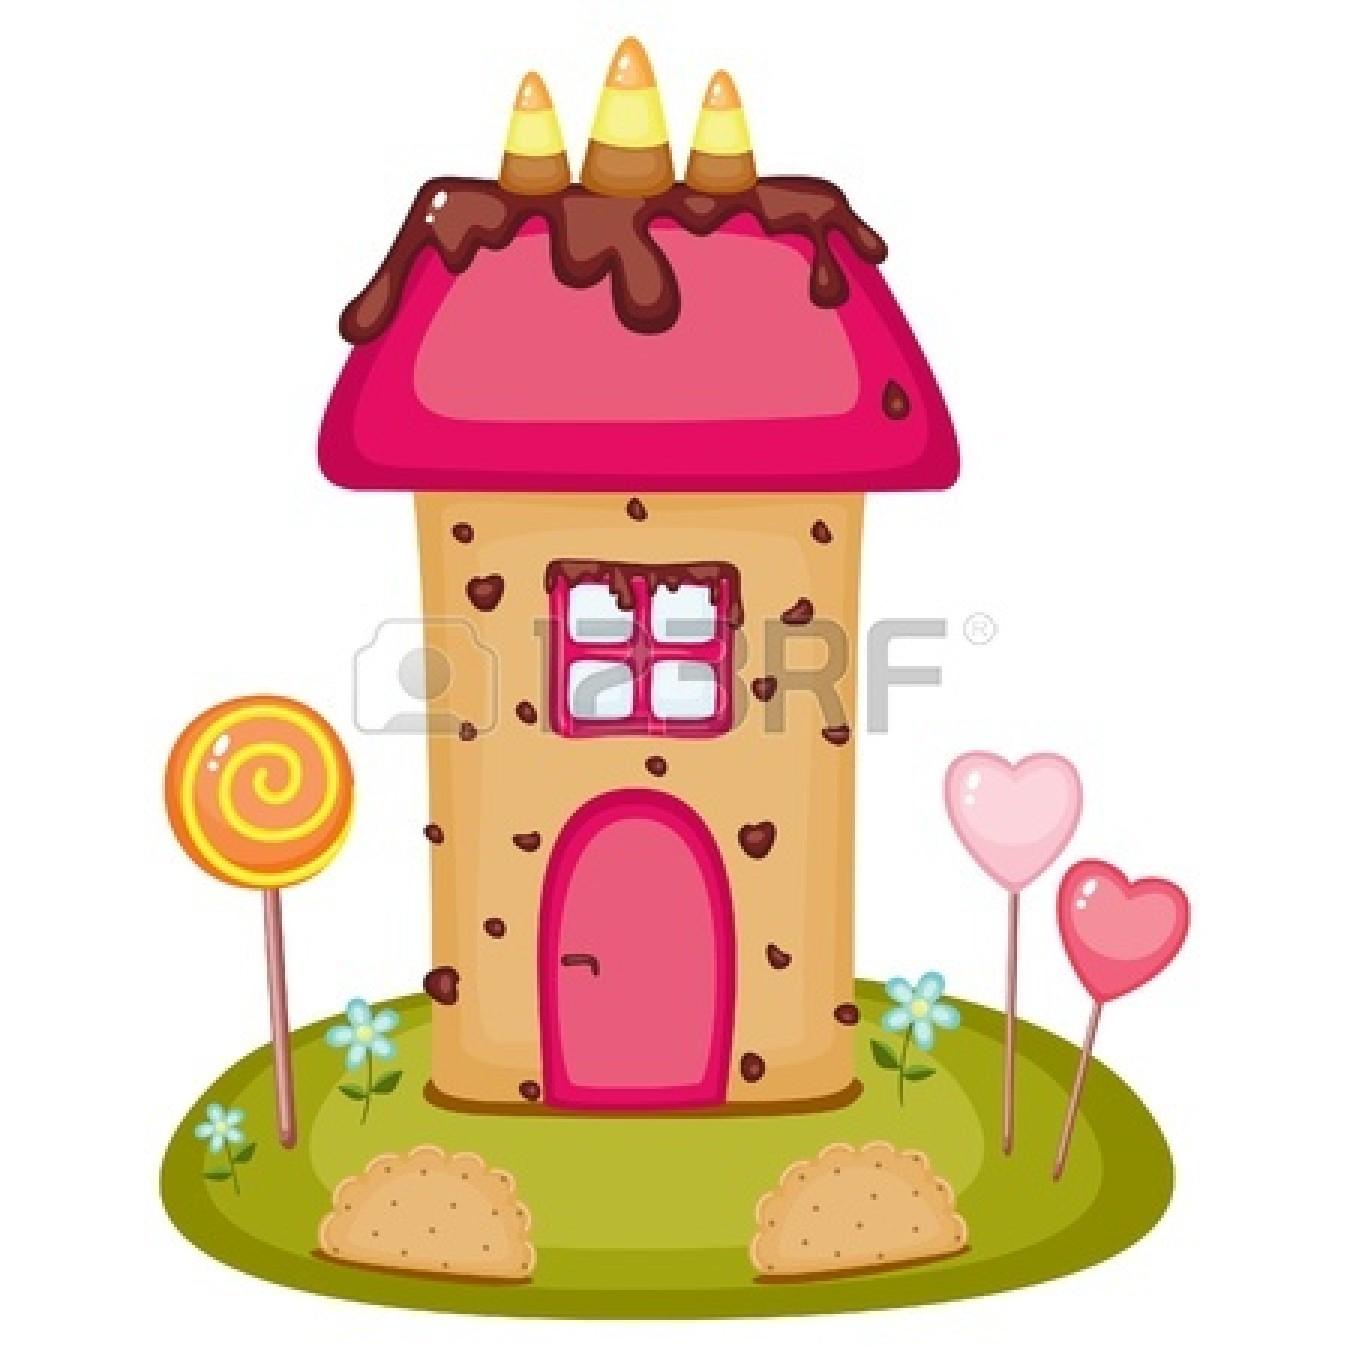 sugar cookie candy house clipart panda free clipart images rh clipartpanda com sugar cookie clipart Cake Slice Clip Art